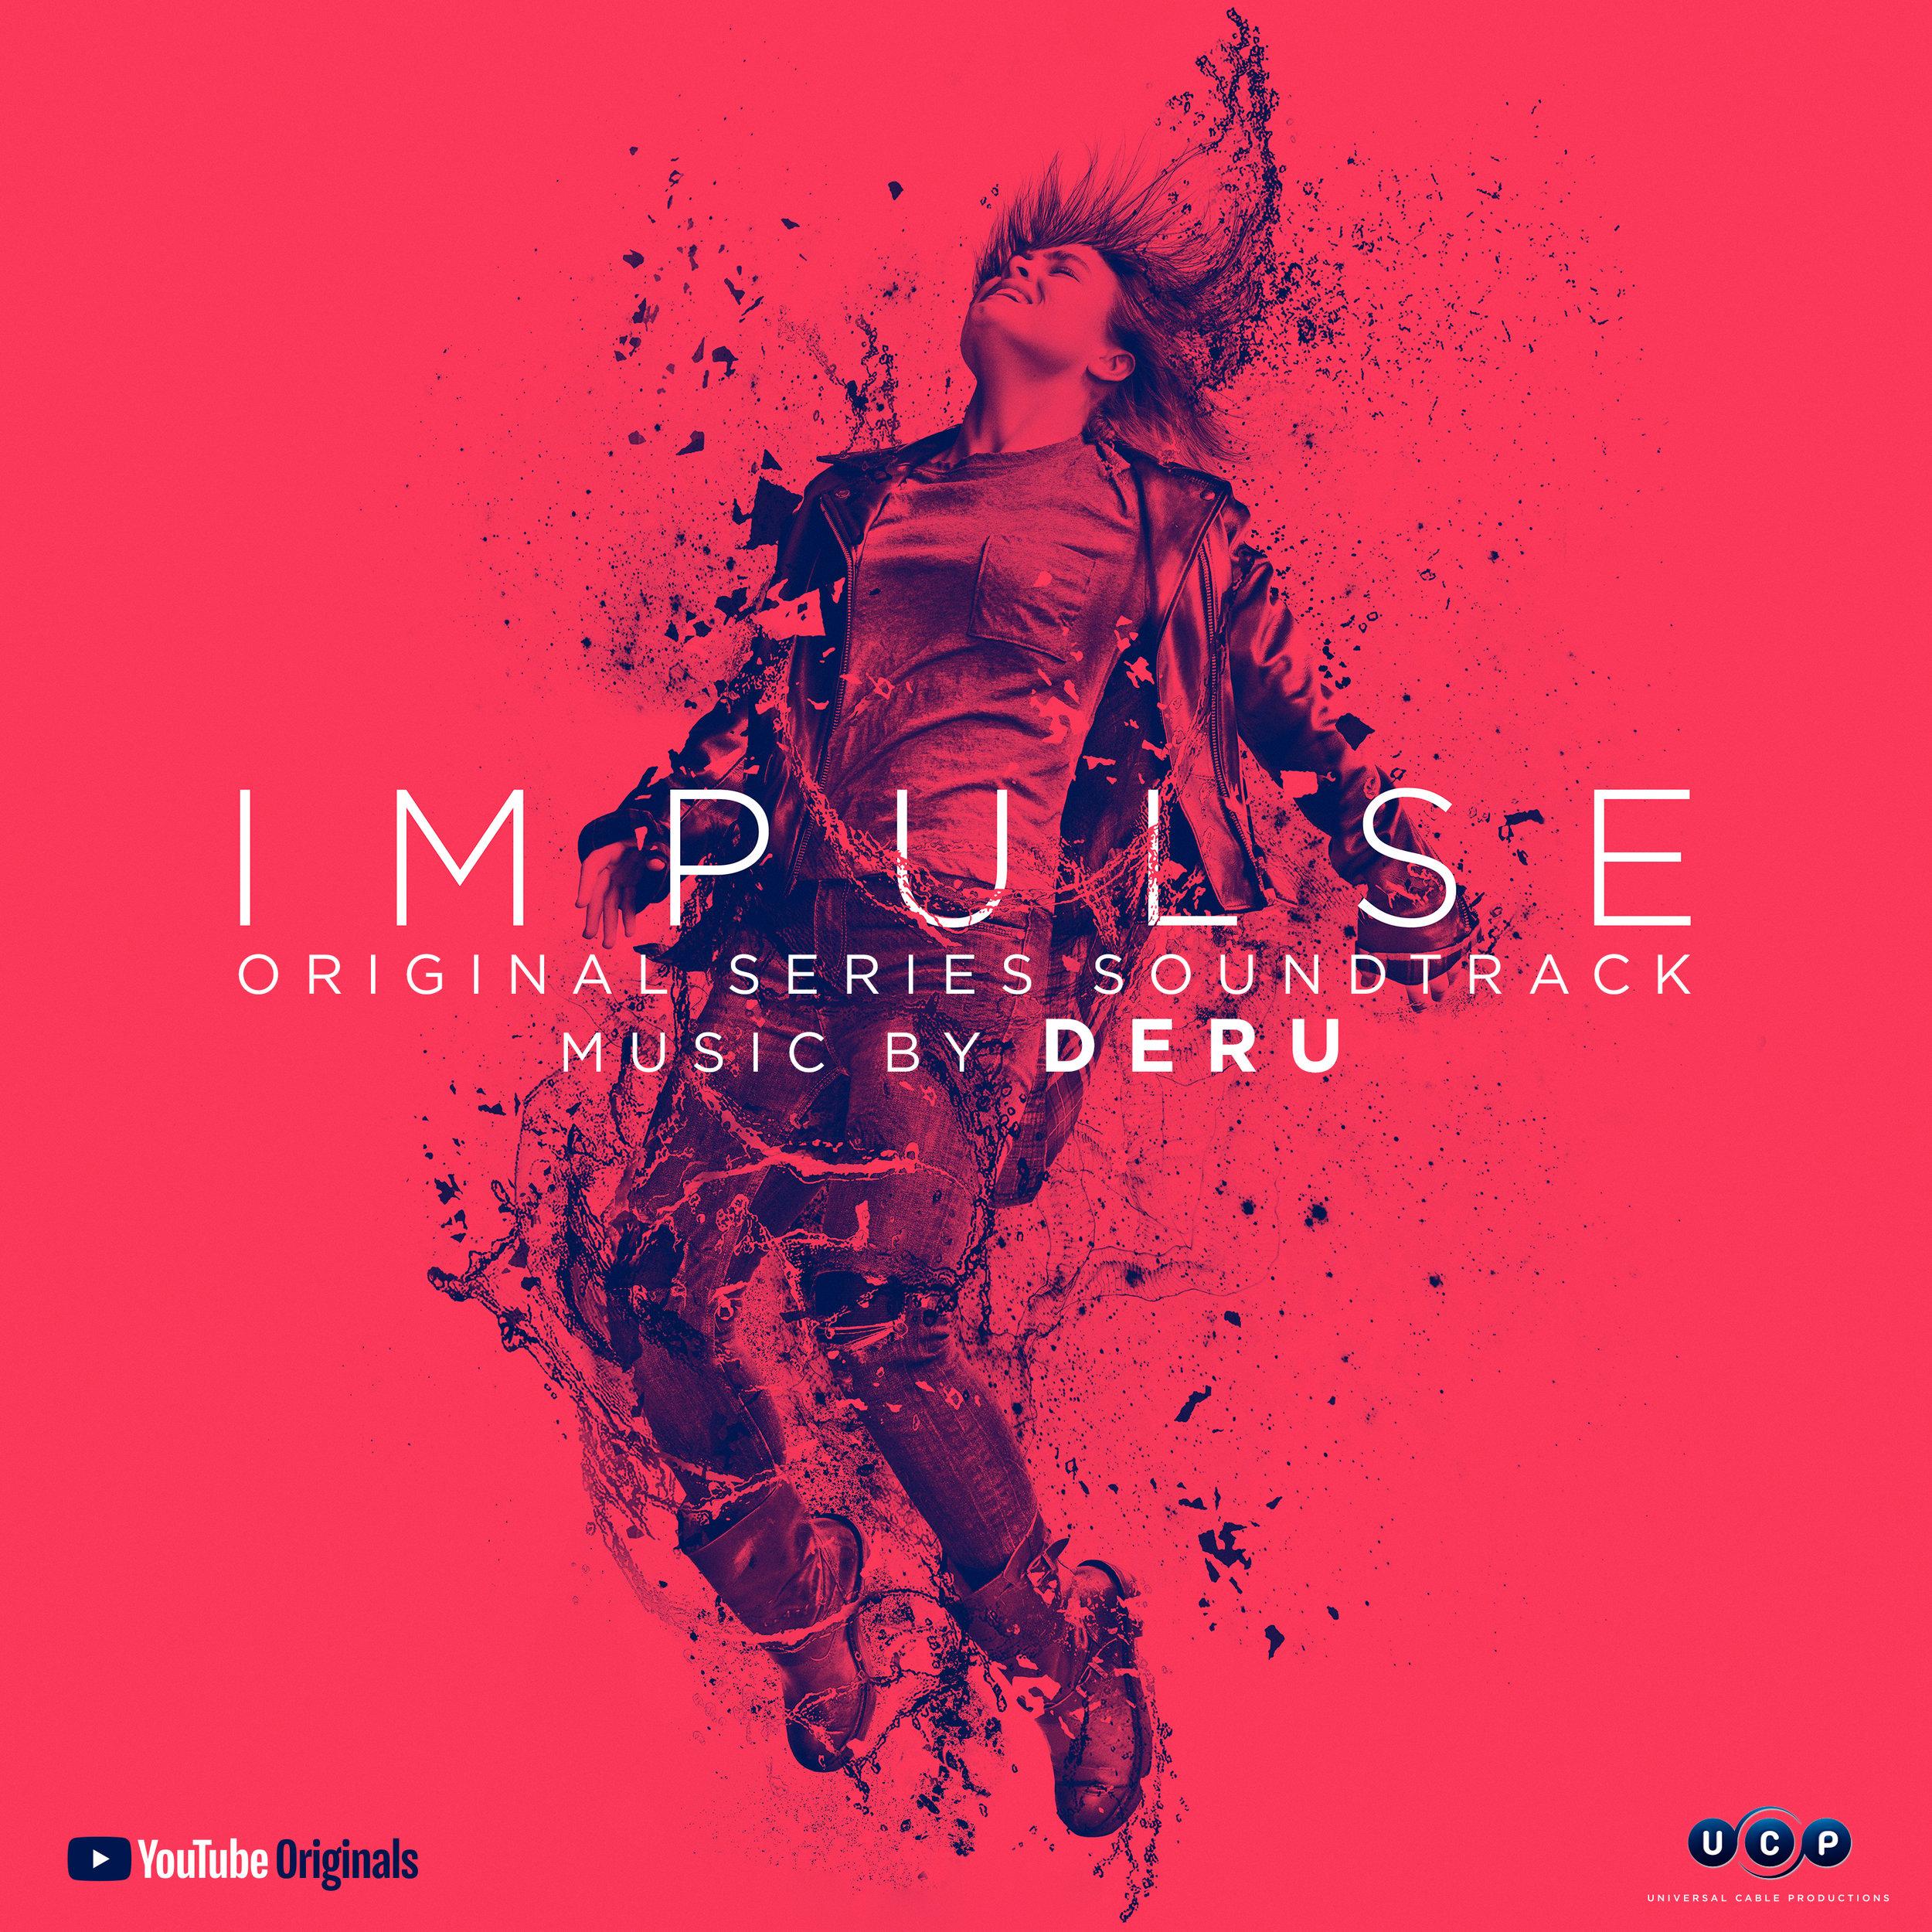 Deru_Impulse_Soundtrack_3000_FINAL.jpg